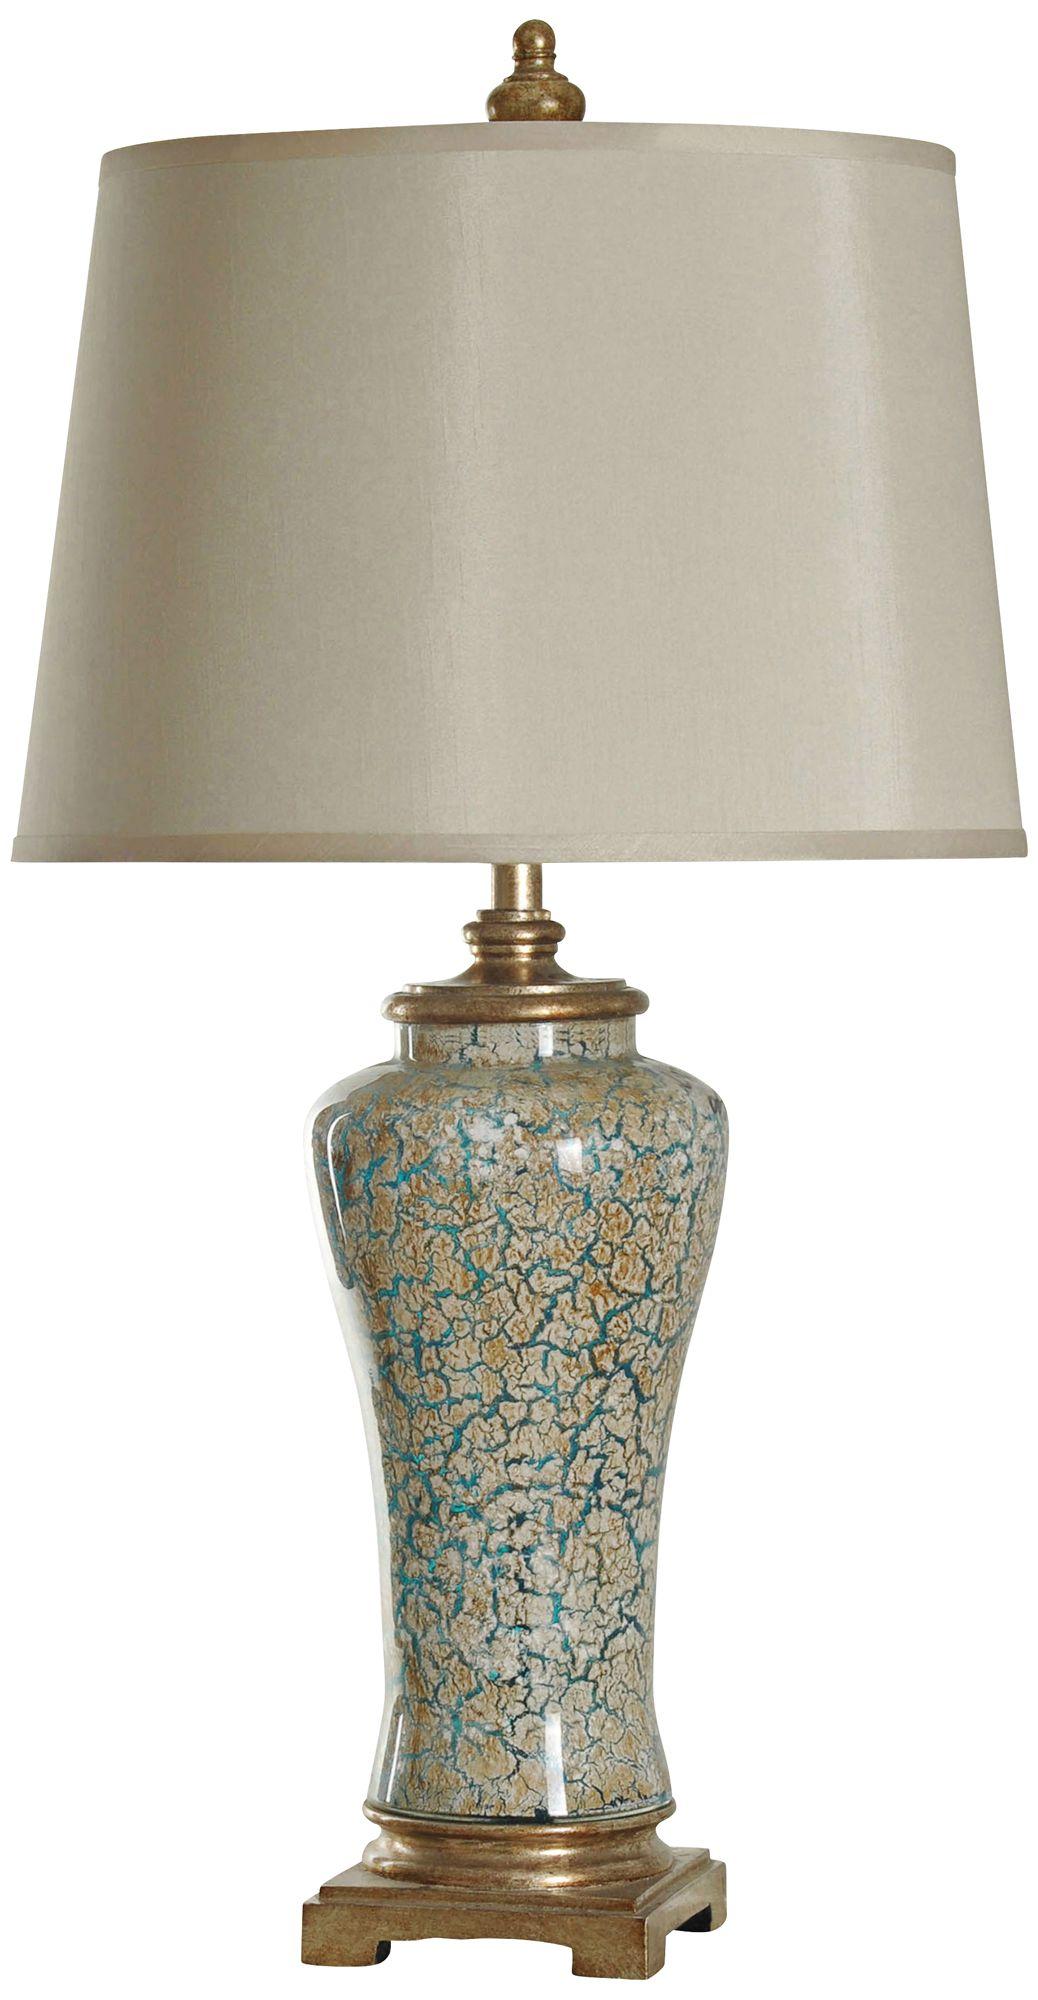 Ginger Caledonia Glass Jar Table Lamp